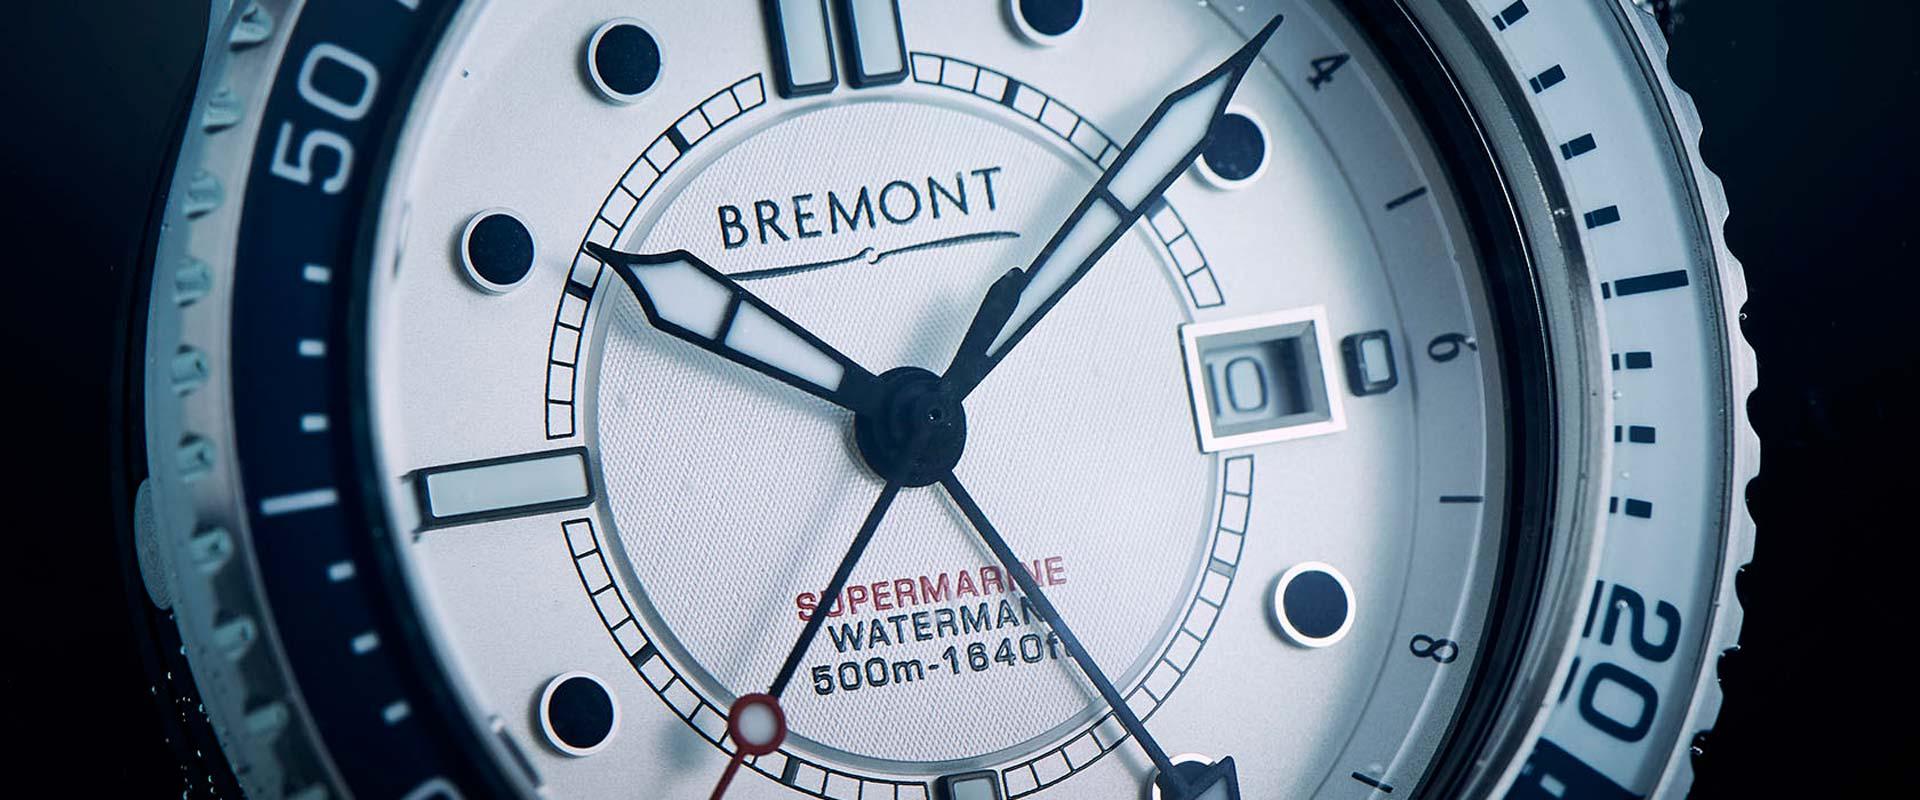 Bremont Waterman